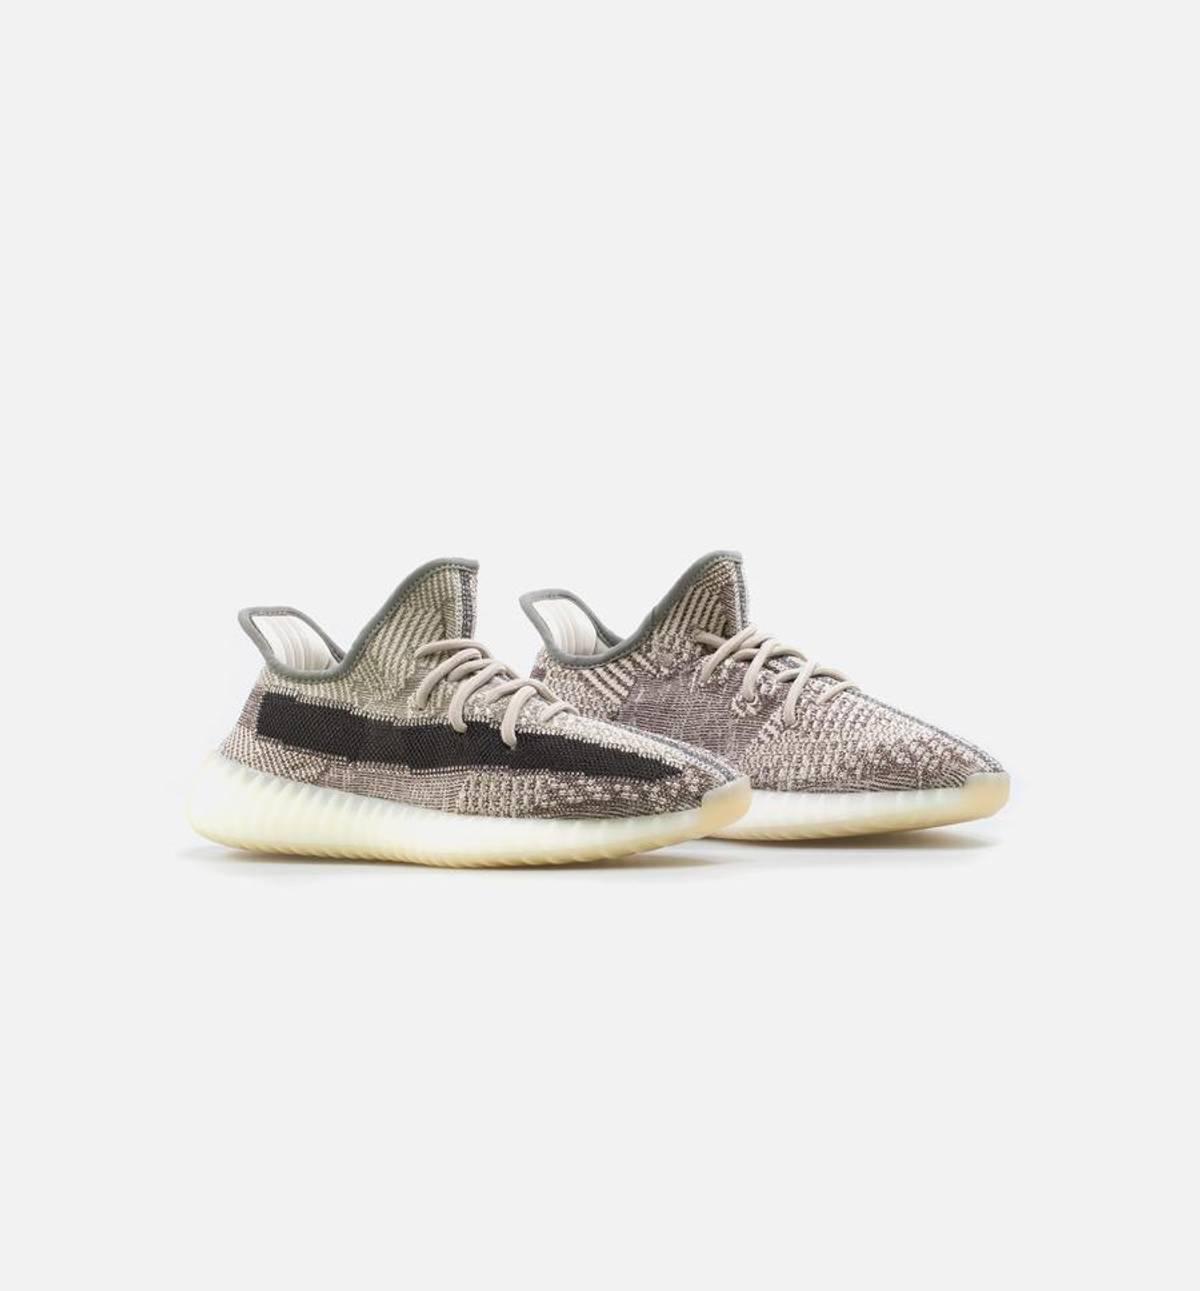 adidas yeezy boost 350 v2 zyon 6.5